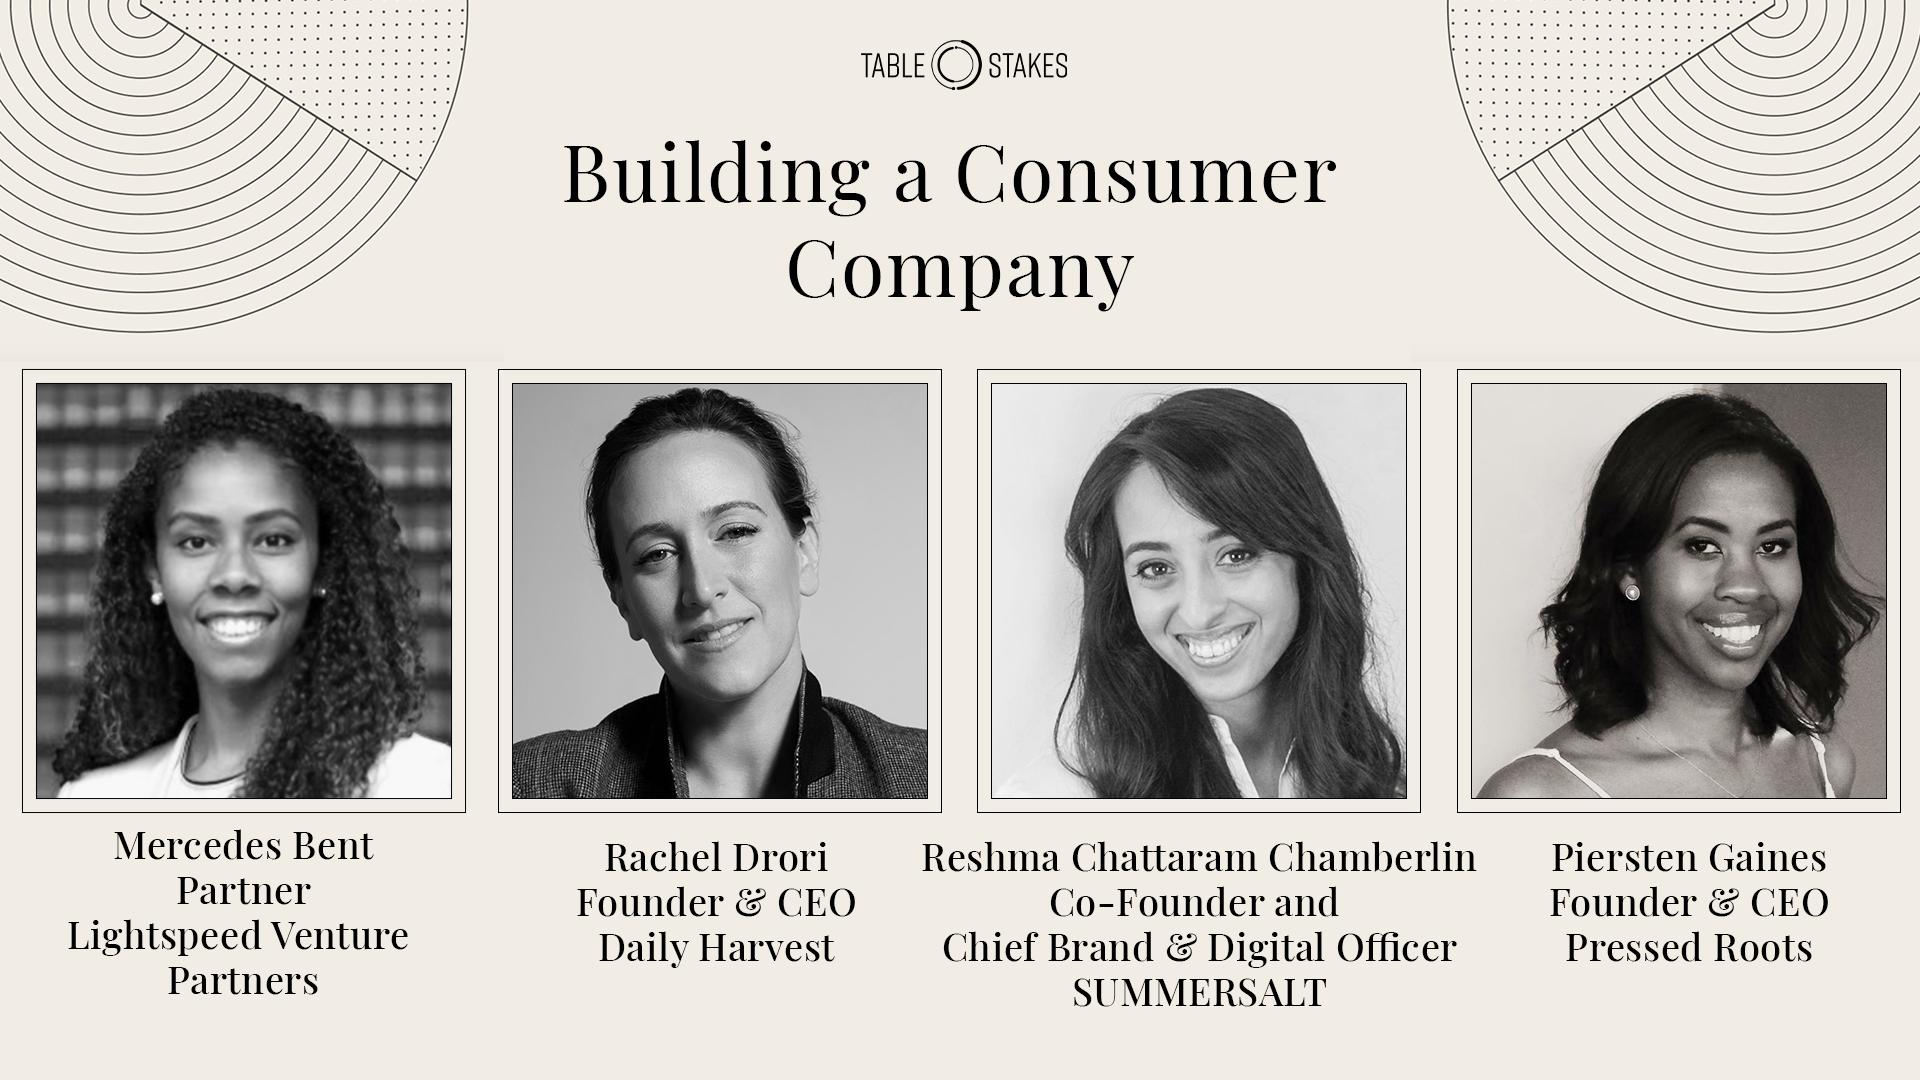 Building a consumer company